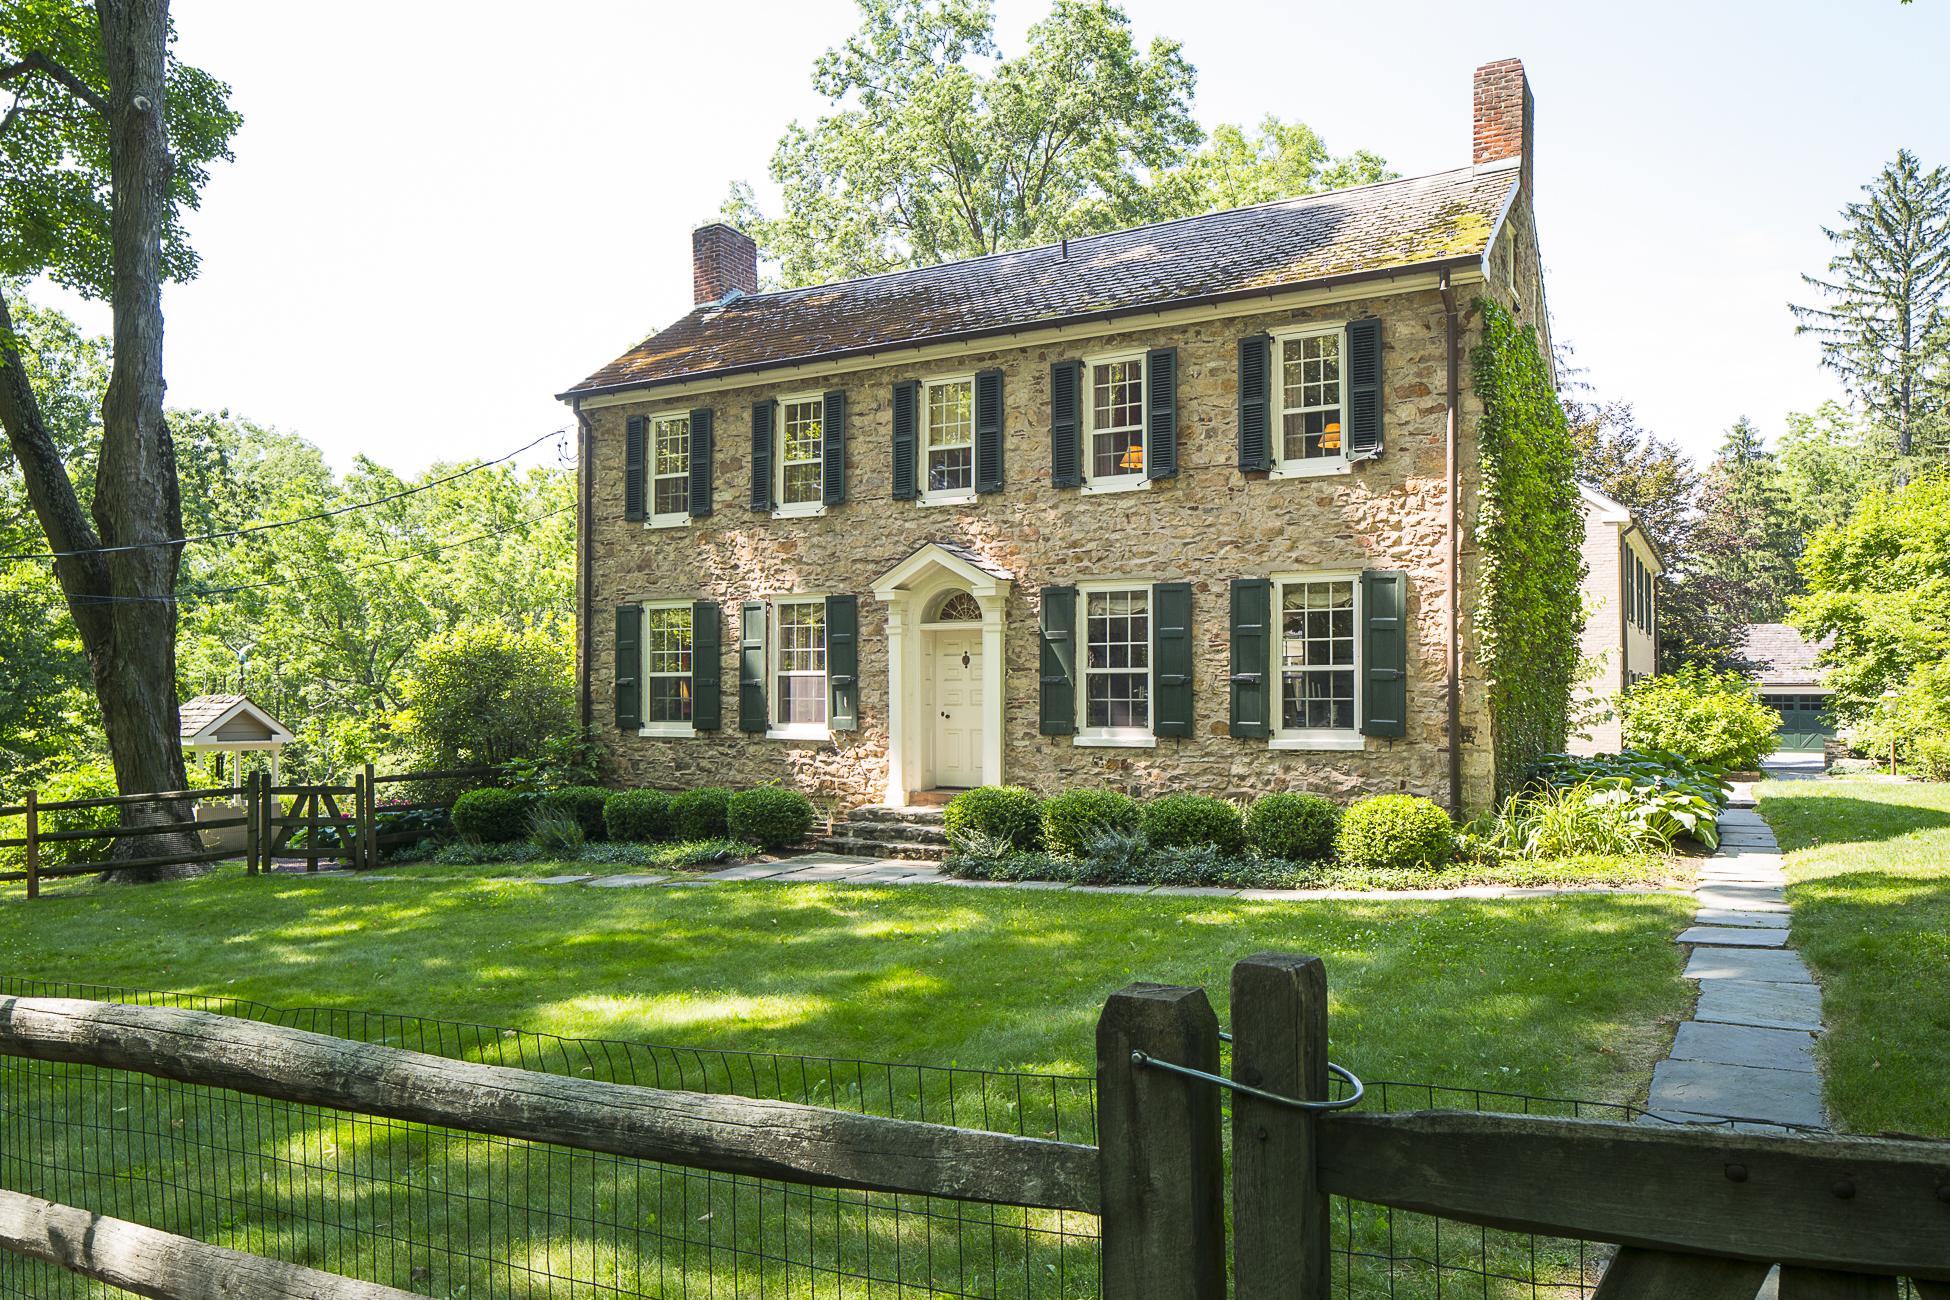 独户住宅 为 销售 在 Circa 1760 Farmhouse is a 21st Century Beauty - Hopewell Township 175 Woosamonsa Road Pennington, 新泽西州 08534 美国